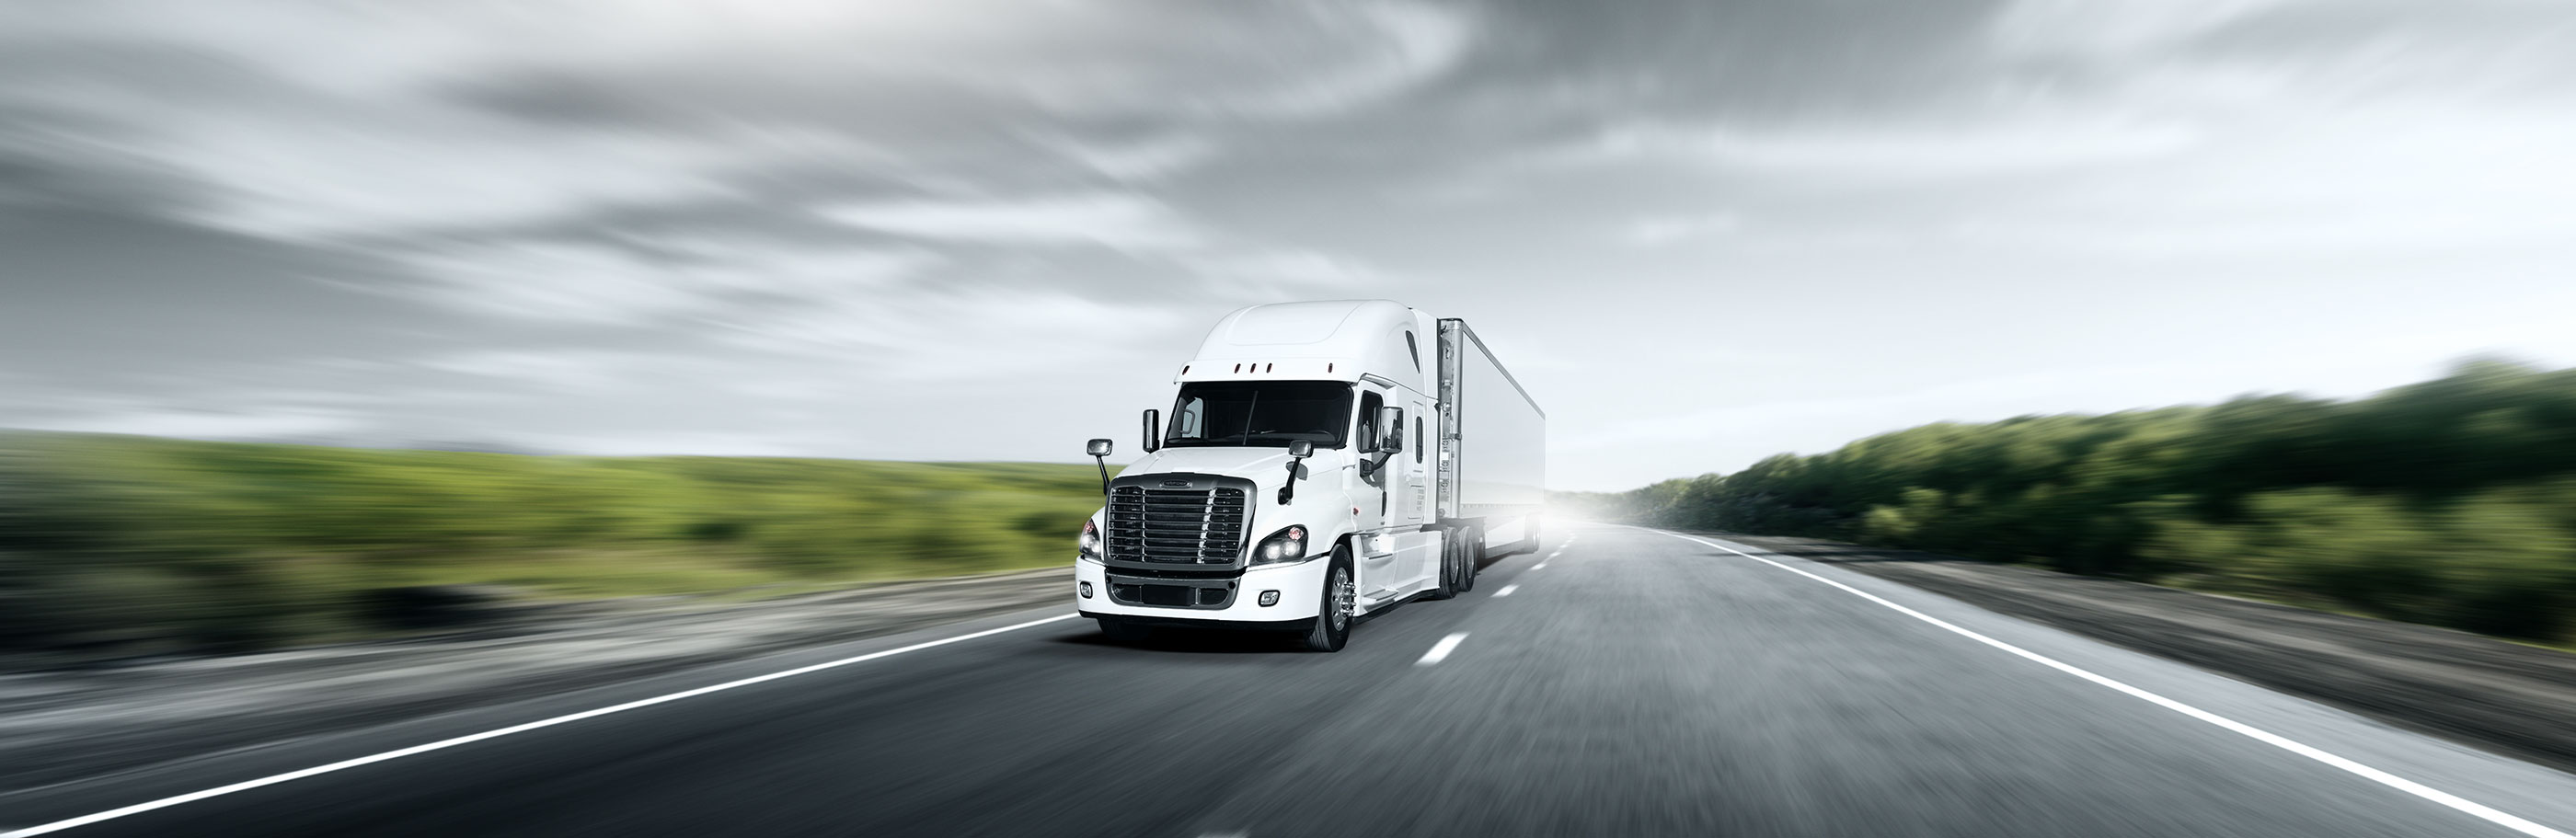 Freight Quote Ltl Cross Border Ltl Truckload  Starship Freight  Transportation